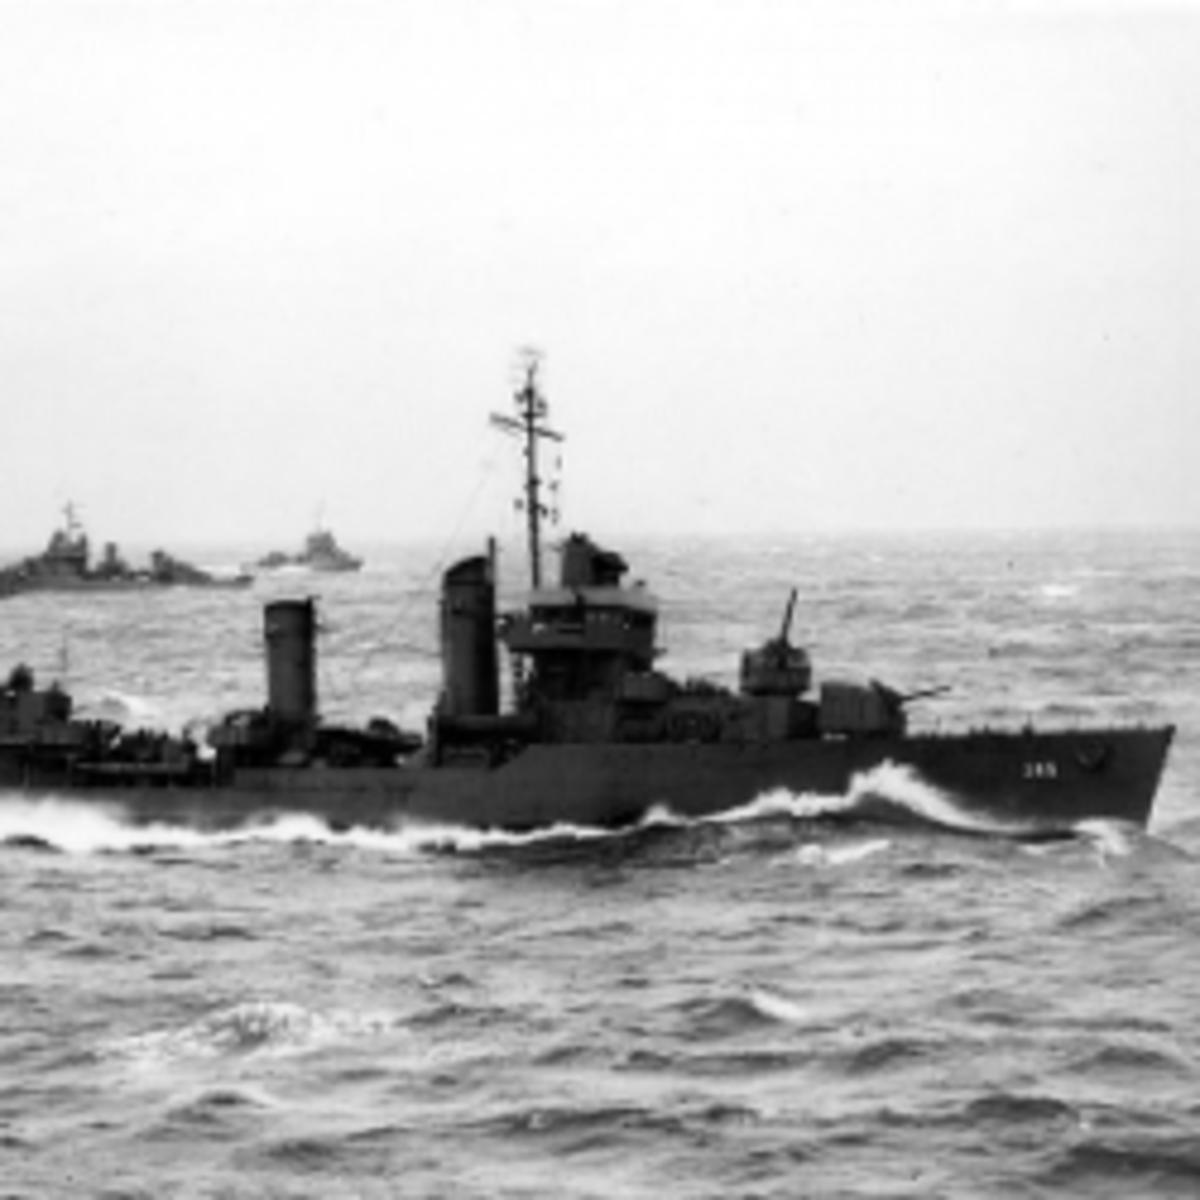 U.S. Naval Flagship